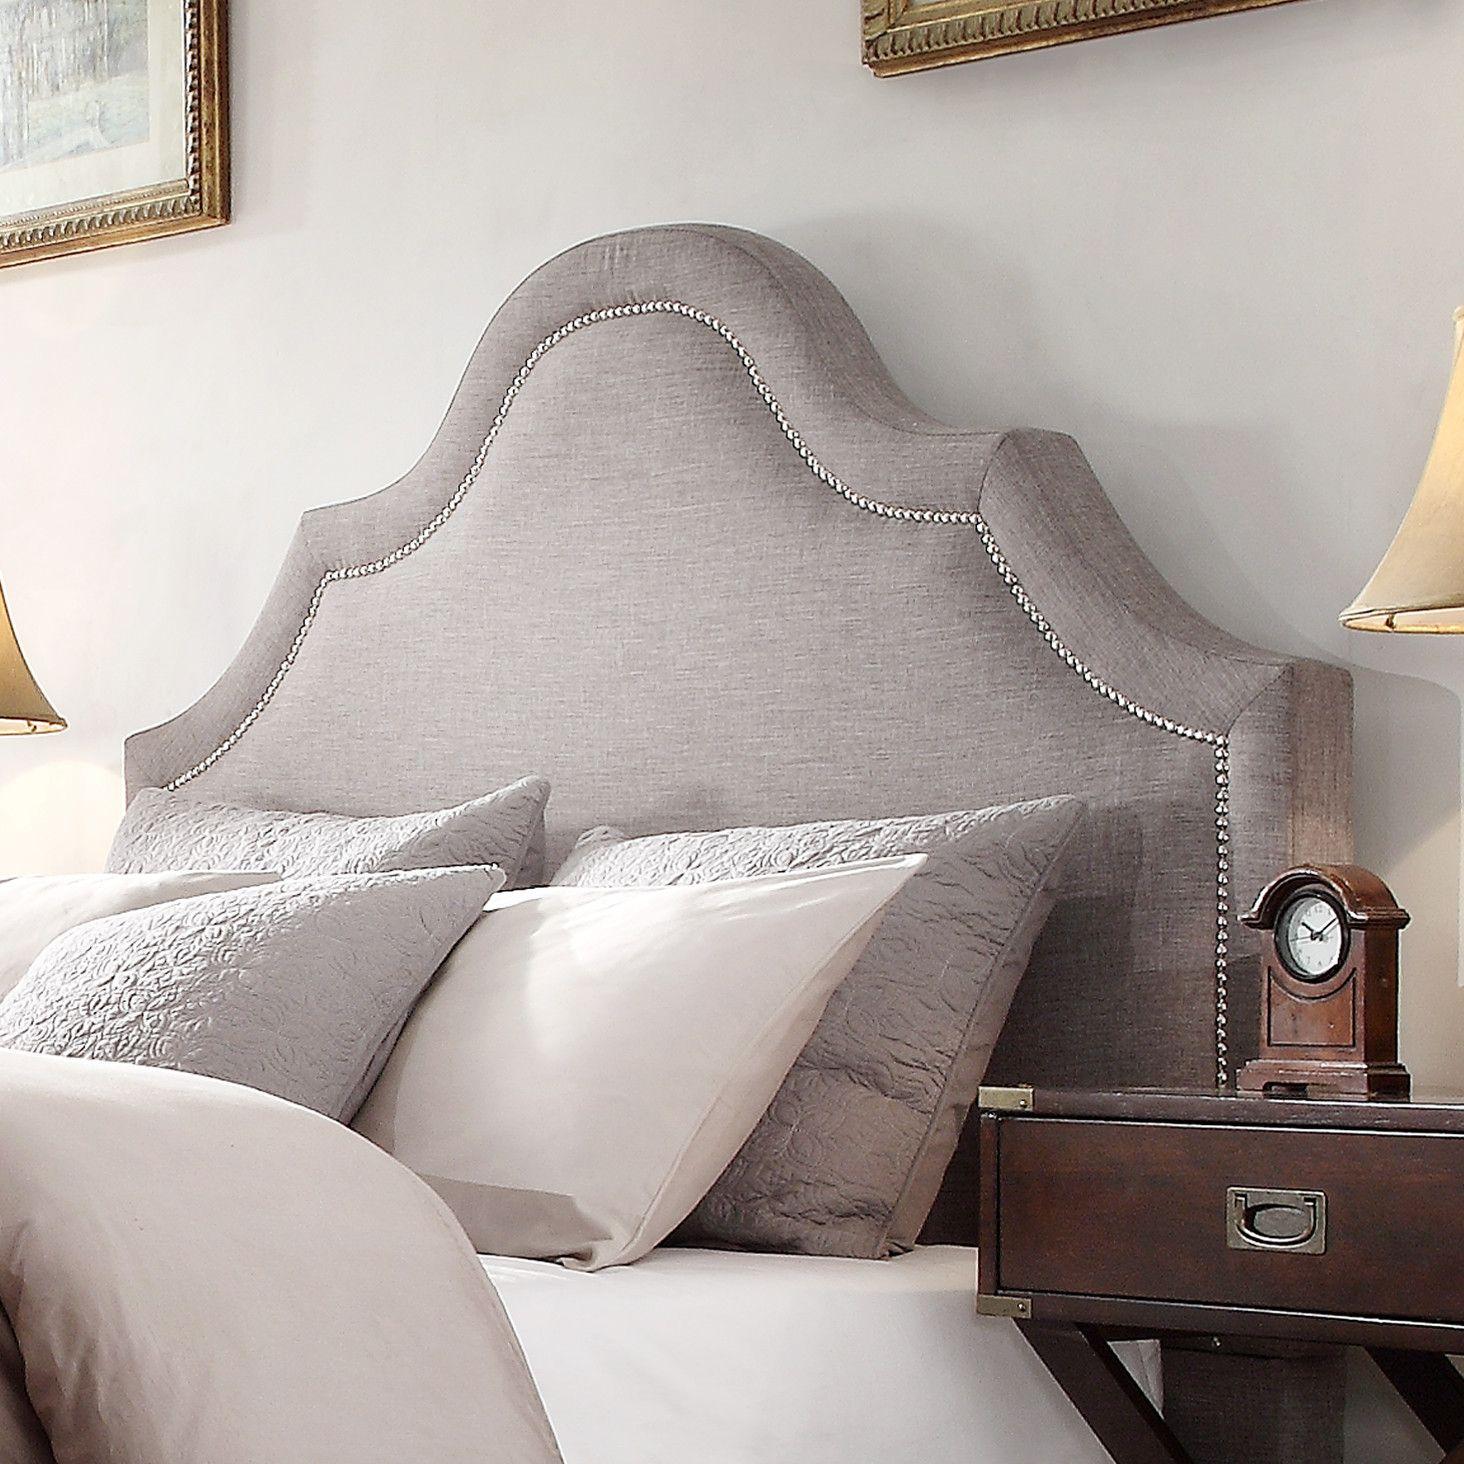 Kingstown Bedroom Furniture Alaoui Upholstered Panel Headboard Home Upholstered Headboards